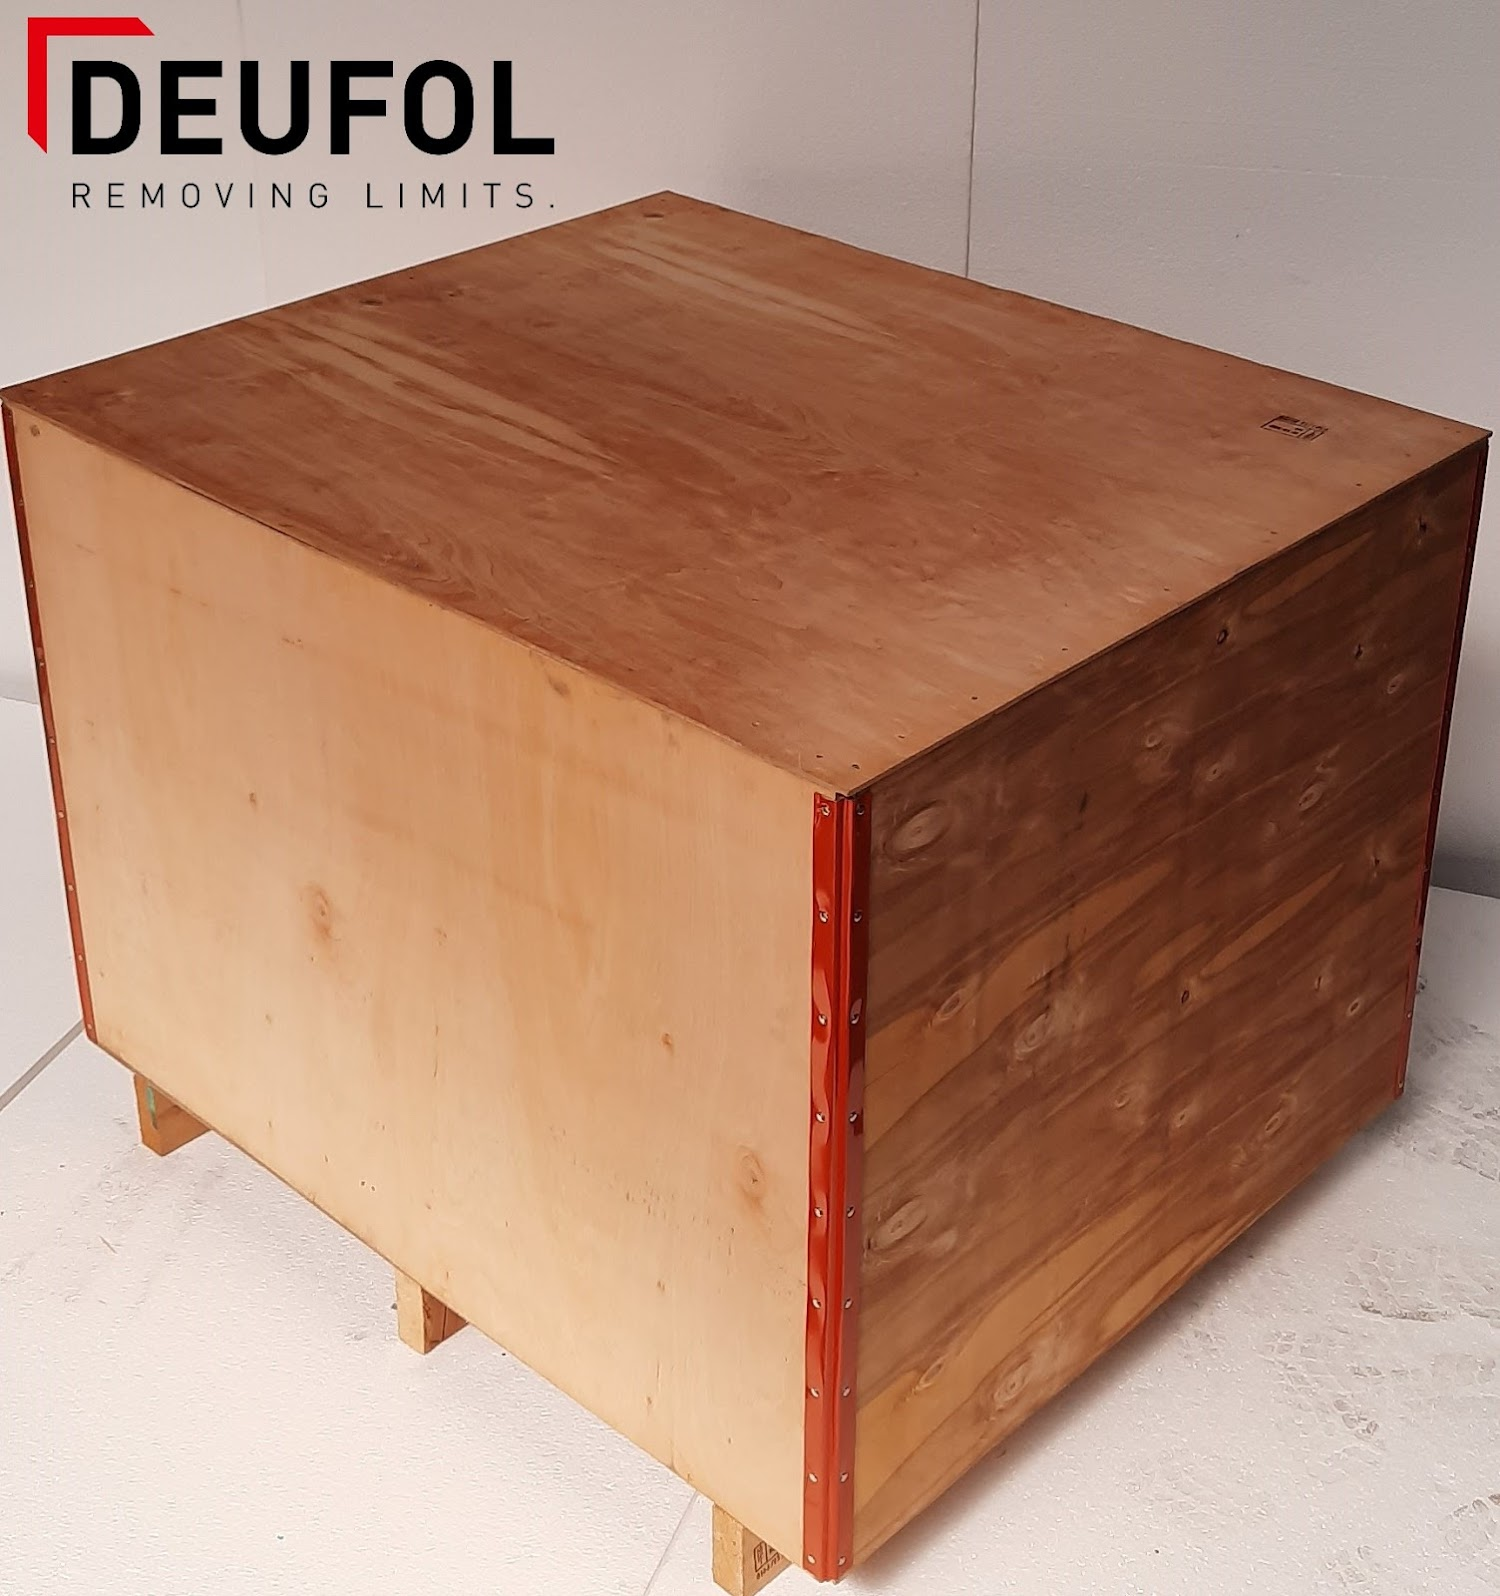 Houten transportkist met deksel 120x80x72cm